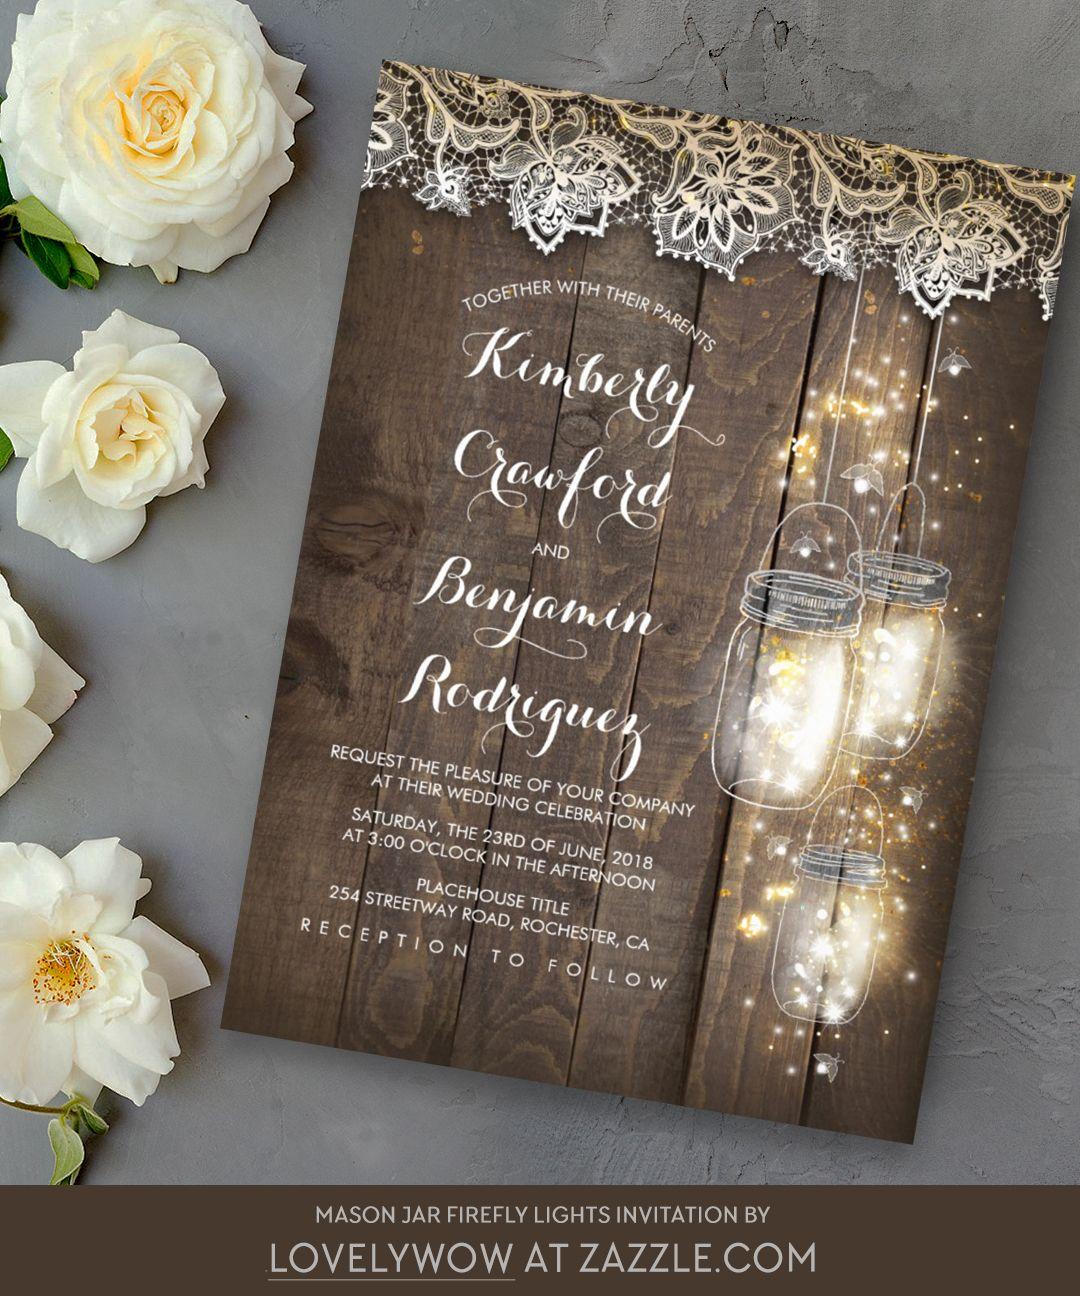 Mason Jar Firefly Lights And Lace Rustic Wedding Invitation Zazzle Com In 2020 Wedding Invitations Rustic Mason Jar Wedding Invitations Country Wedding Invitations